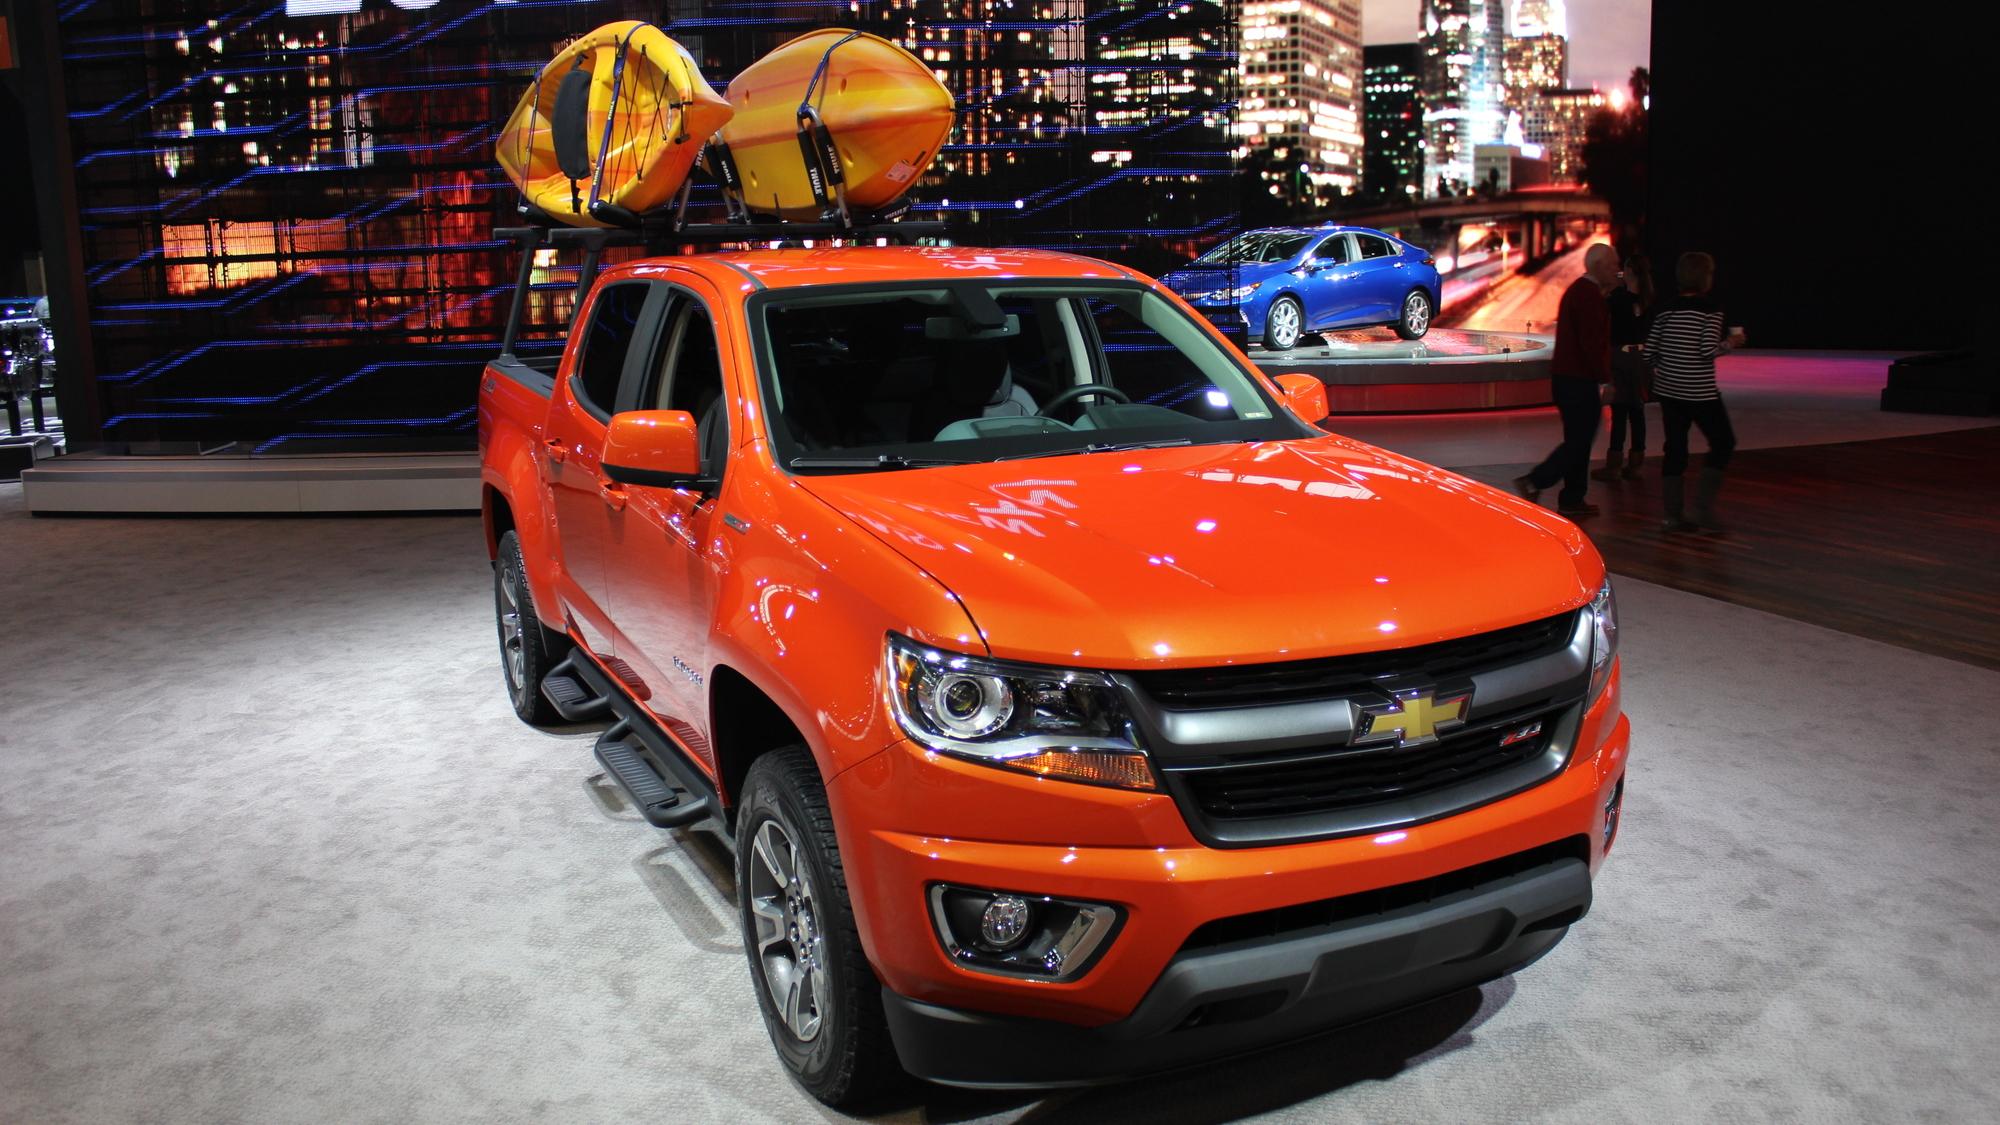 2015 Chevrolet Colorado GearOn Edition, 2015 Chicago Auto Show